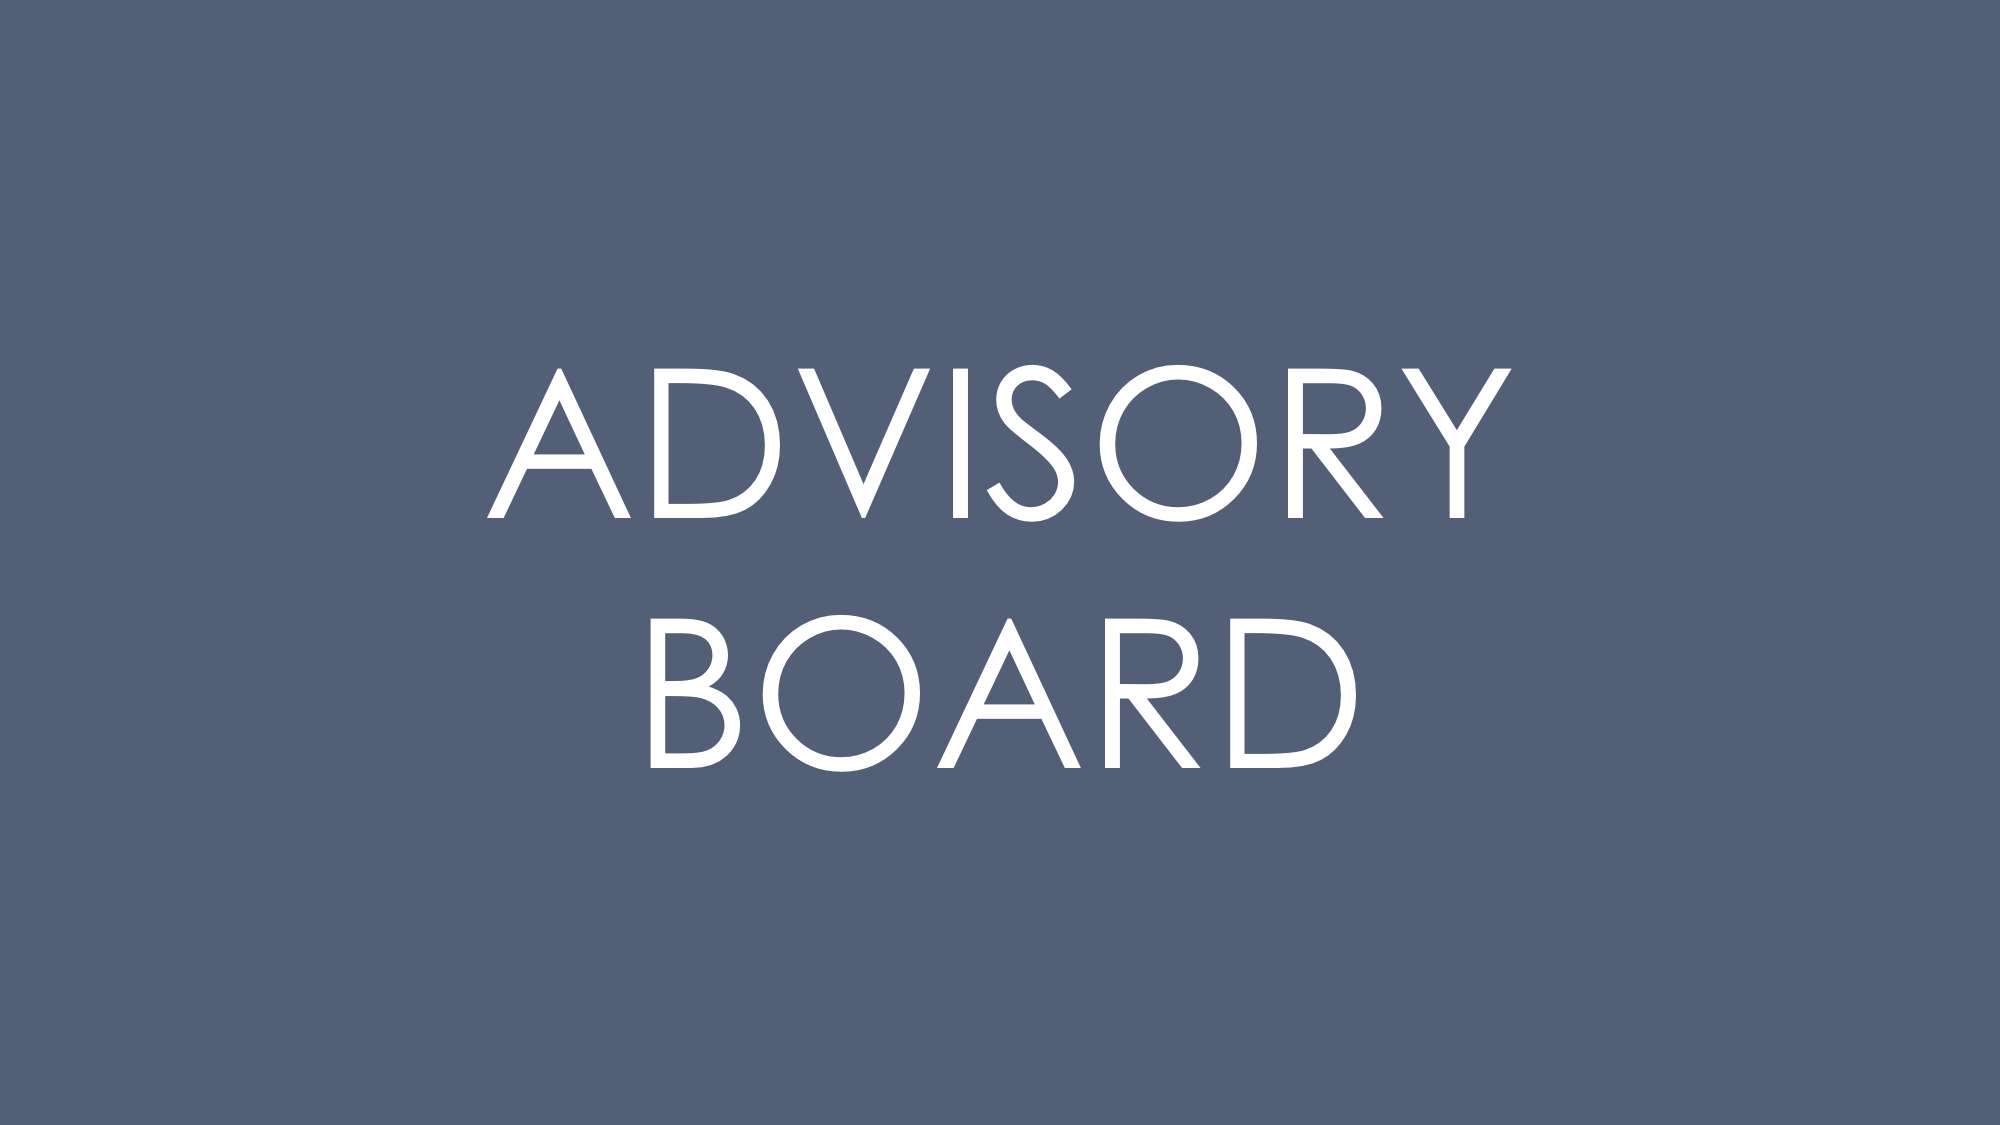 Advisory Board 2.png